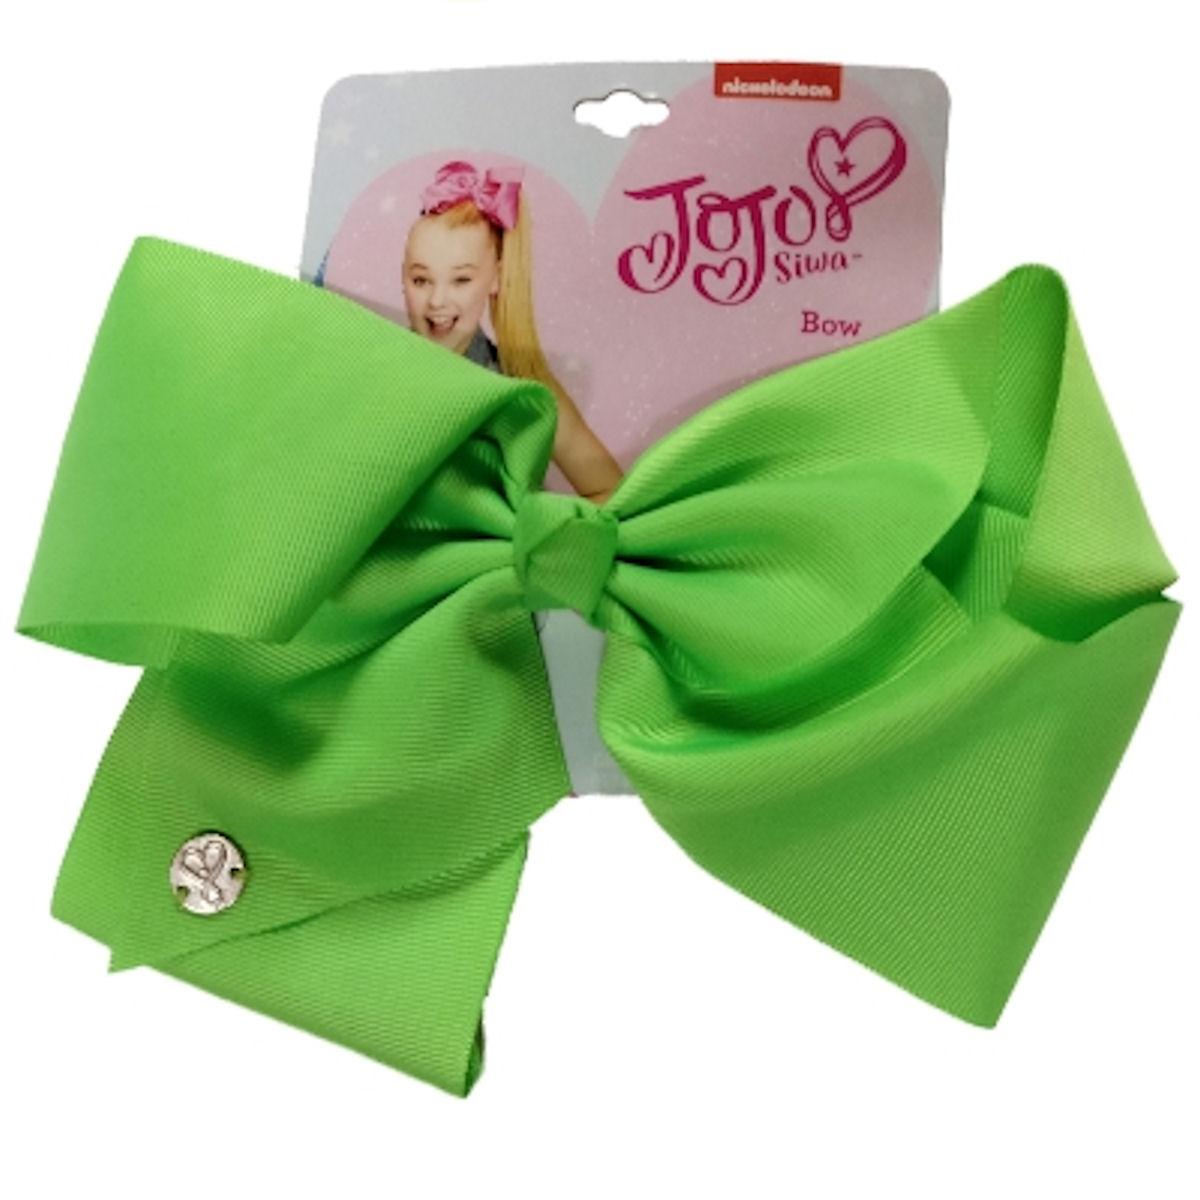 JoJo Siwa Large Cheer Hair Bow (Neon Green)